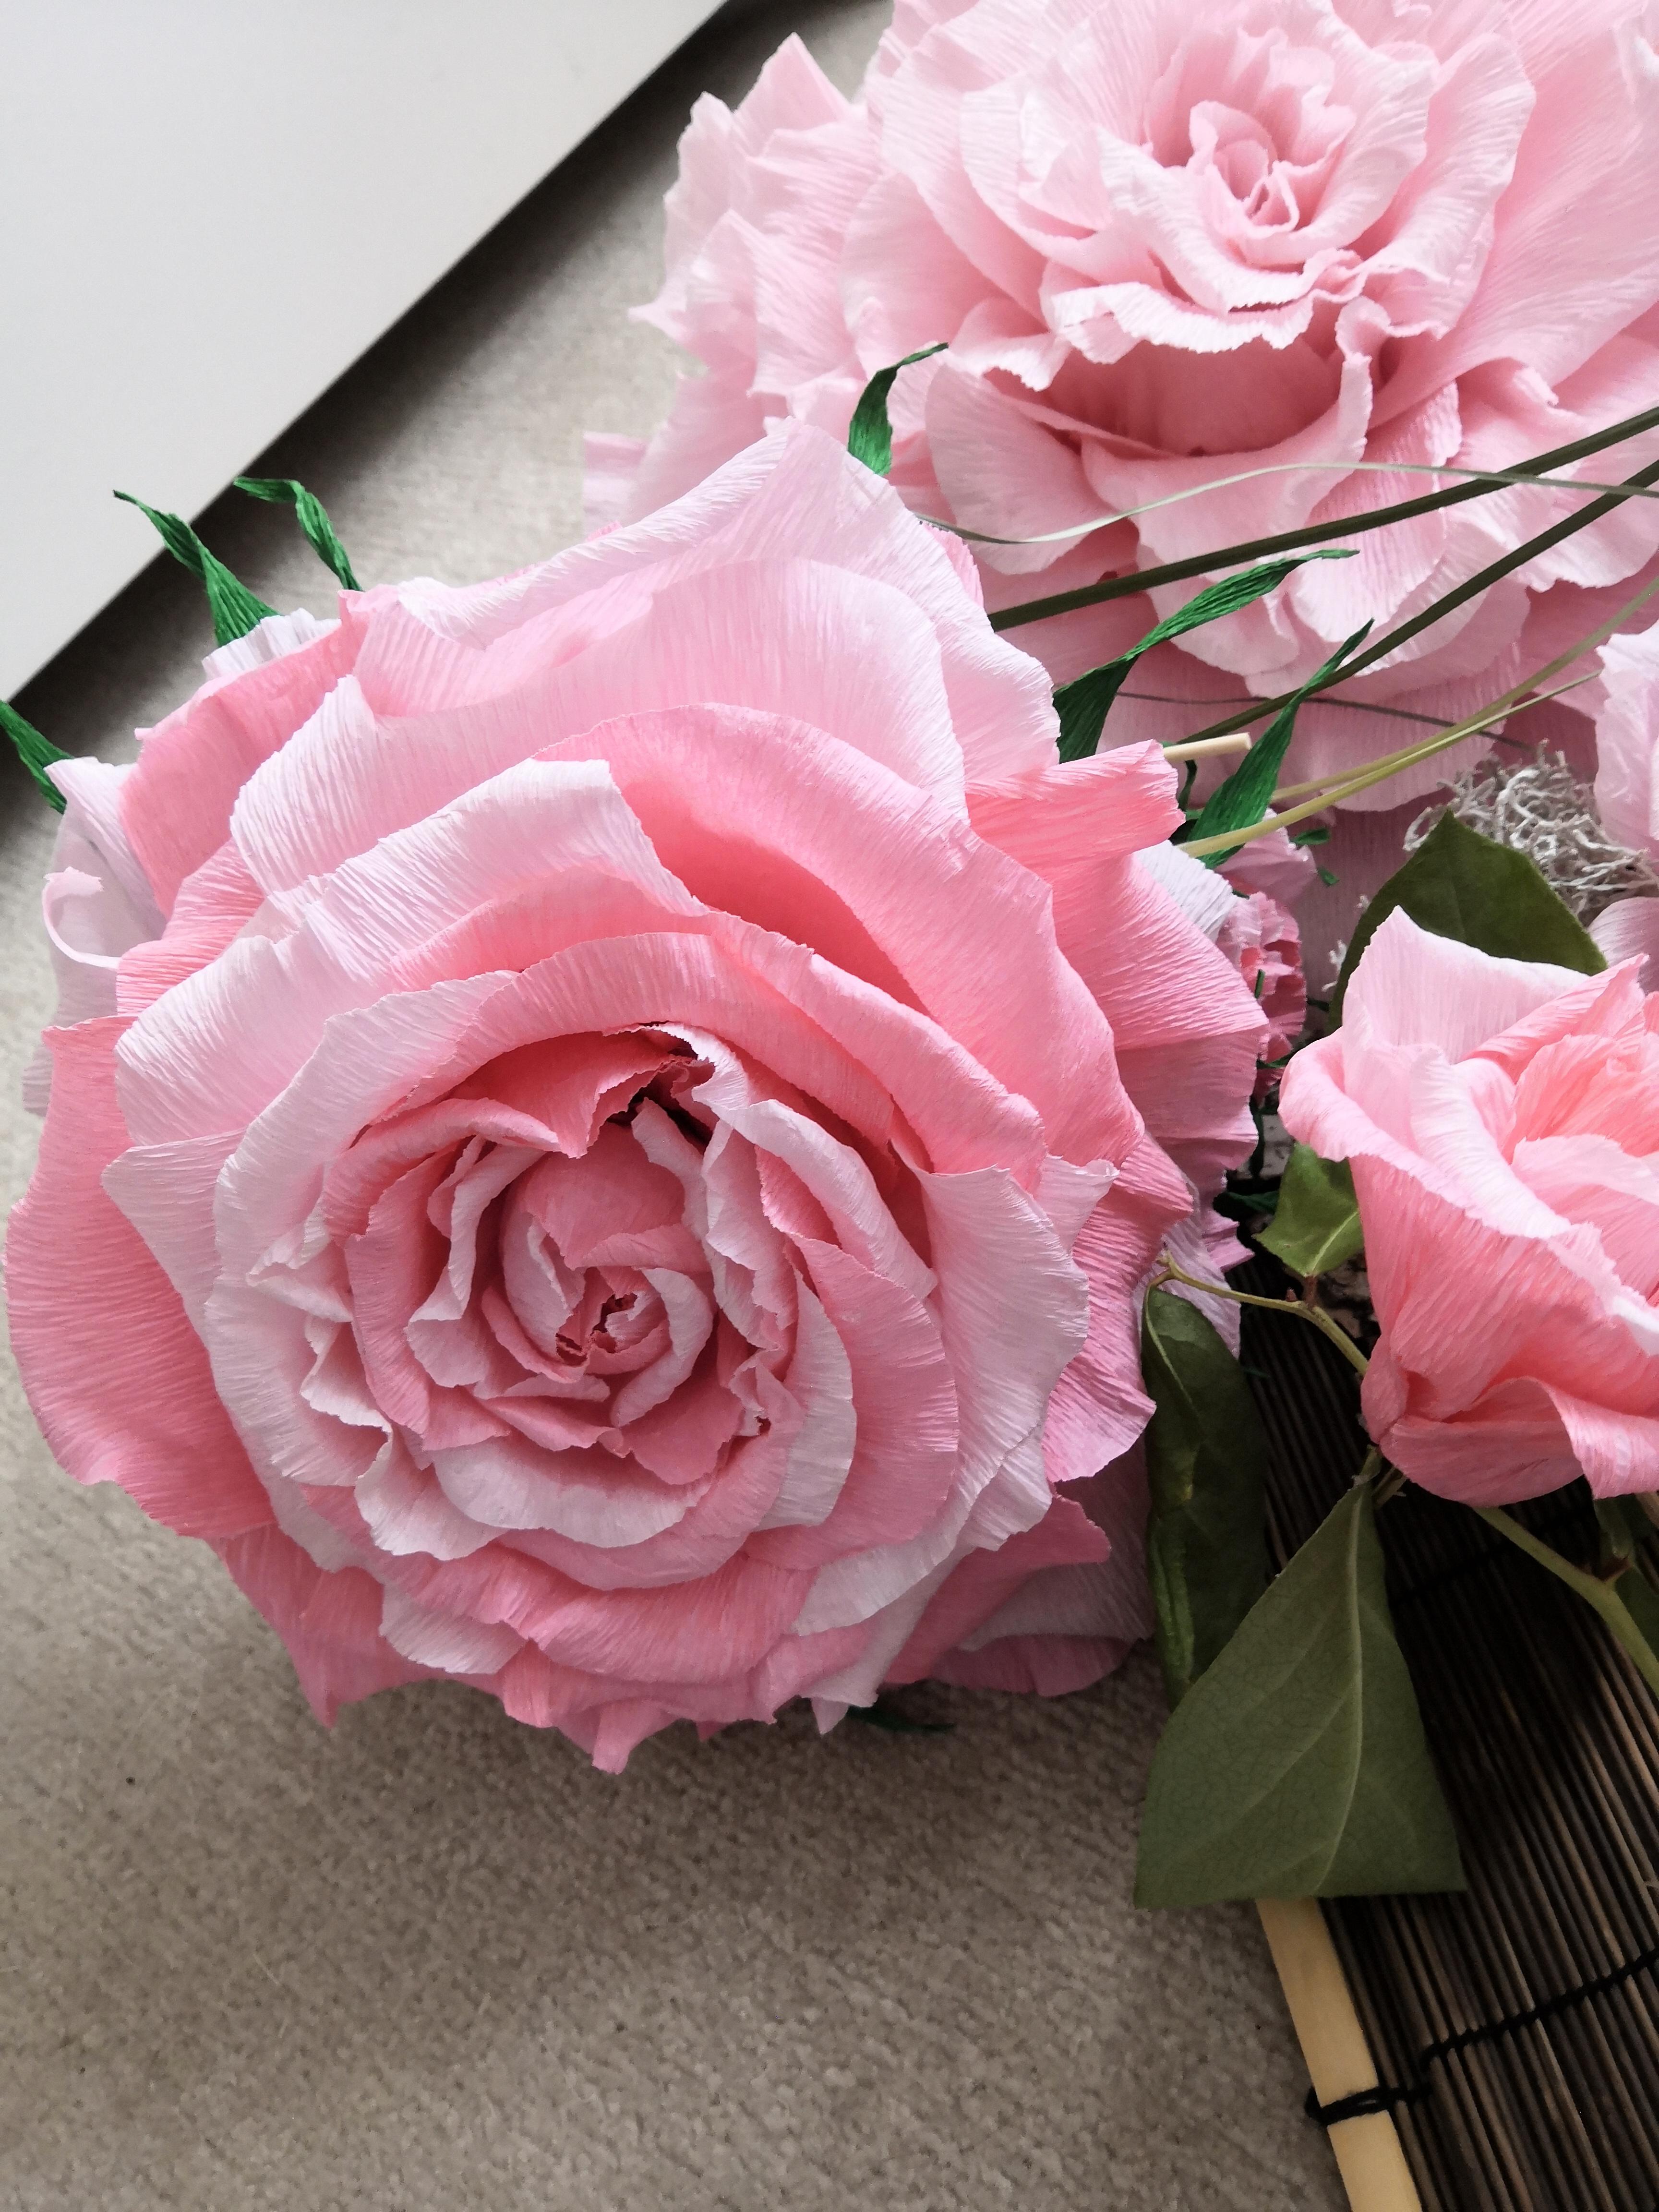 #littlegift #pinkrose #dekoblume